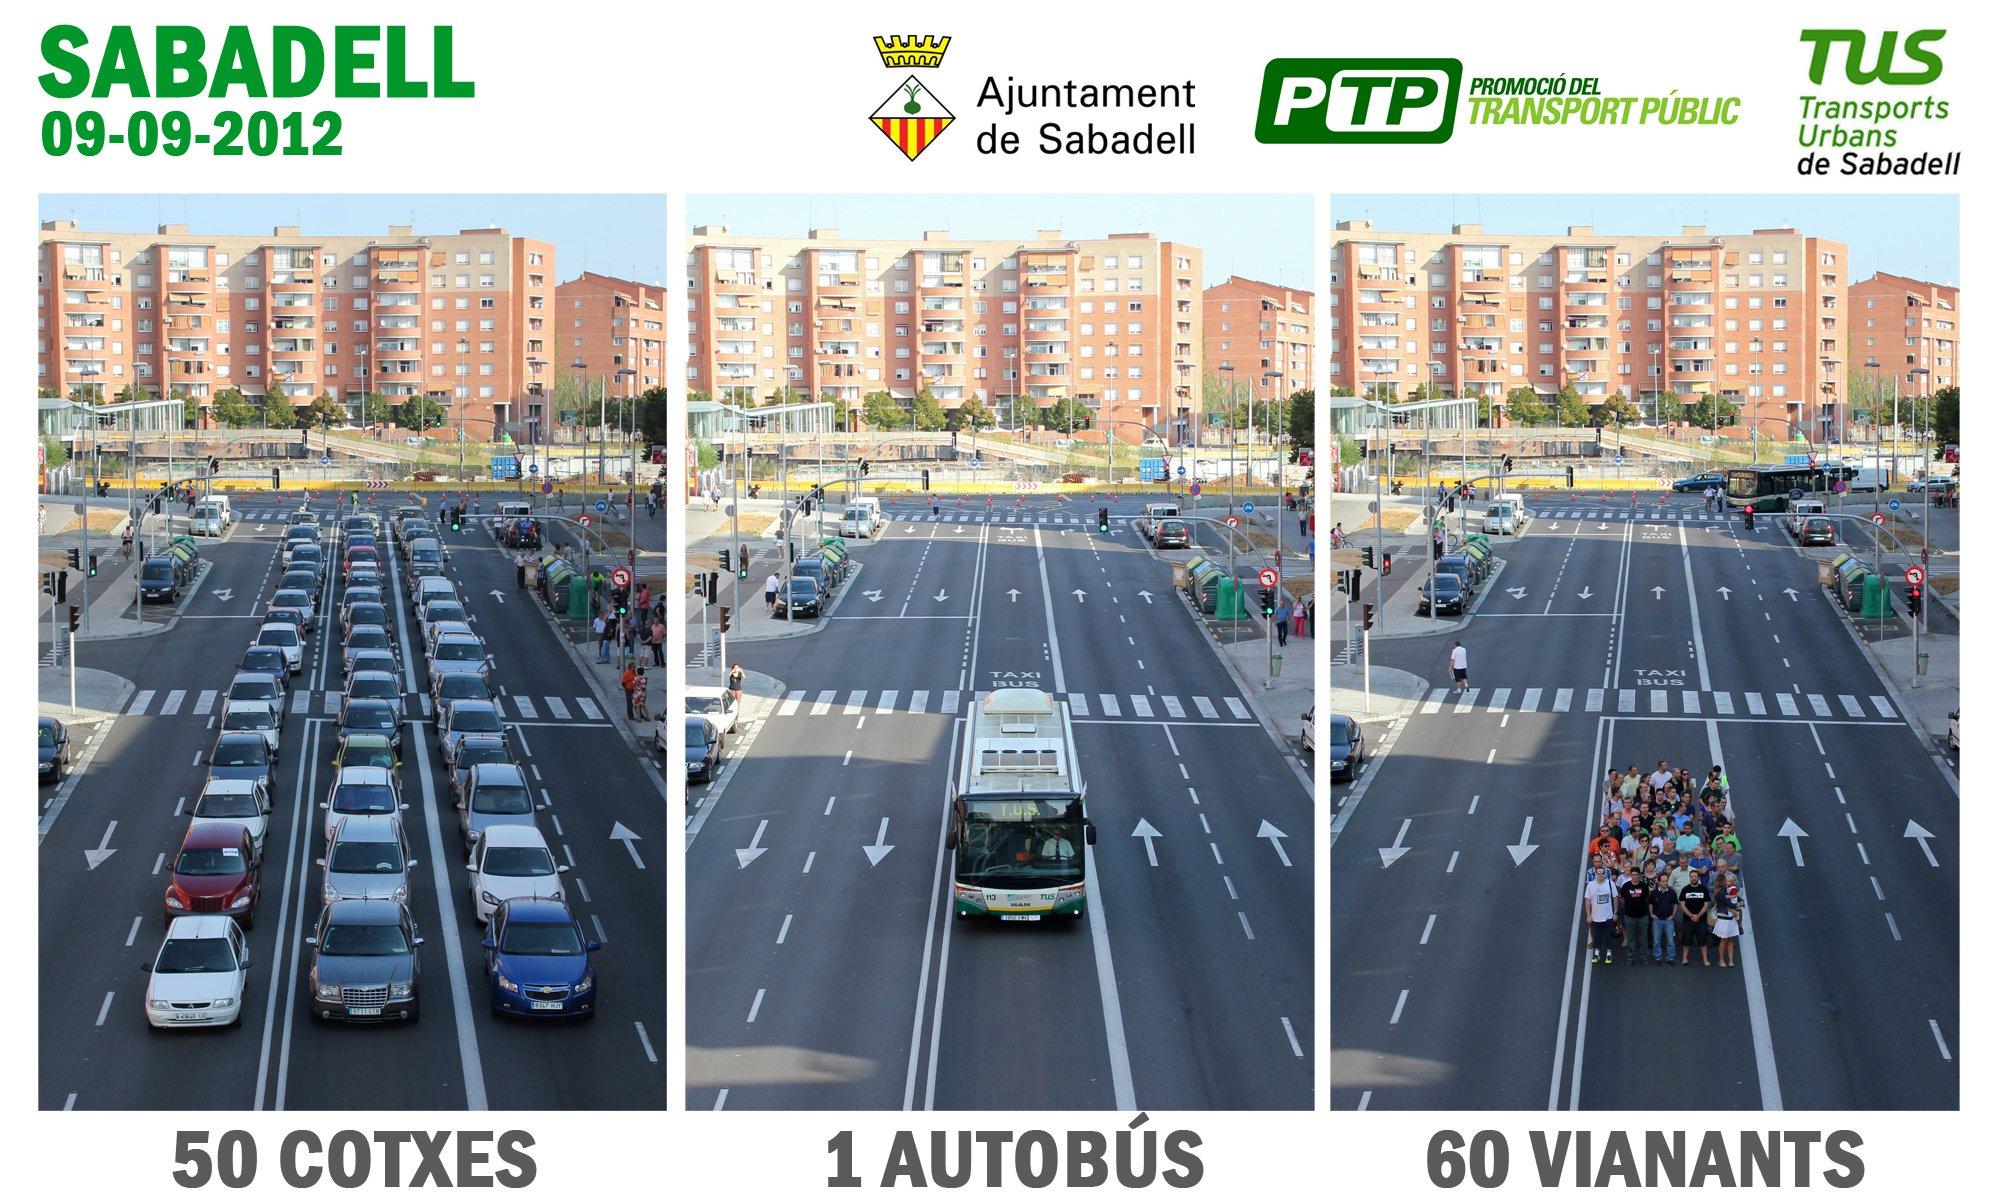 2011 Foto comparativa 50 cotxes 1 autobus 60 vianants Sabadell